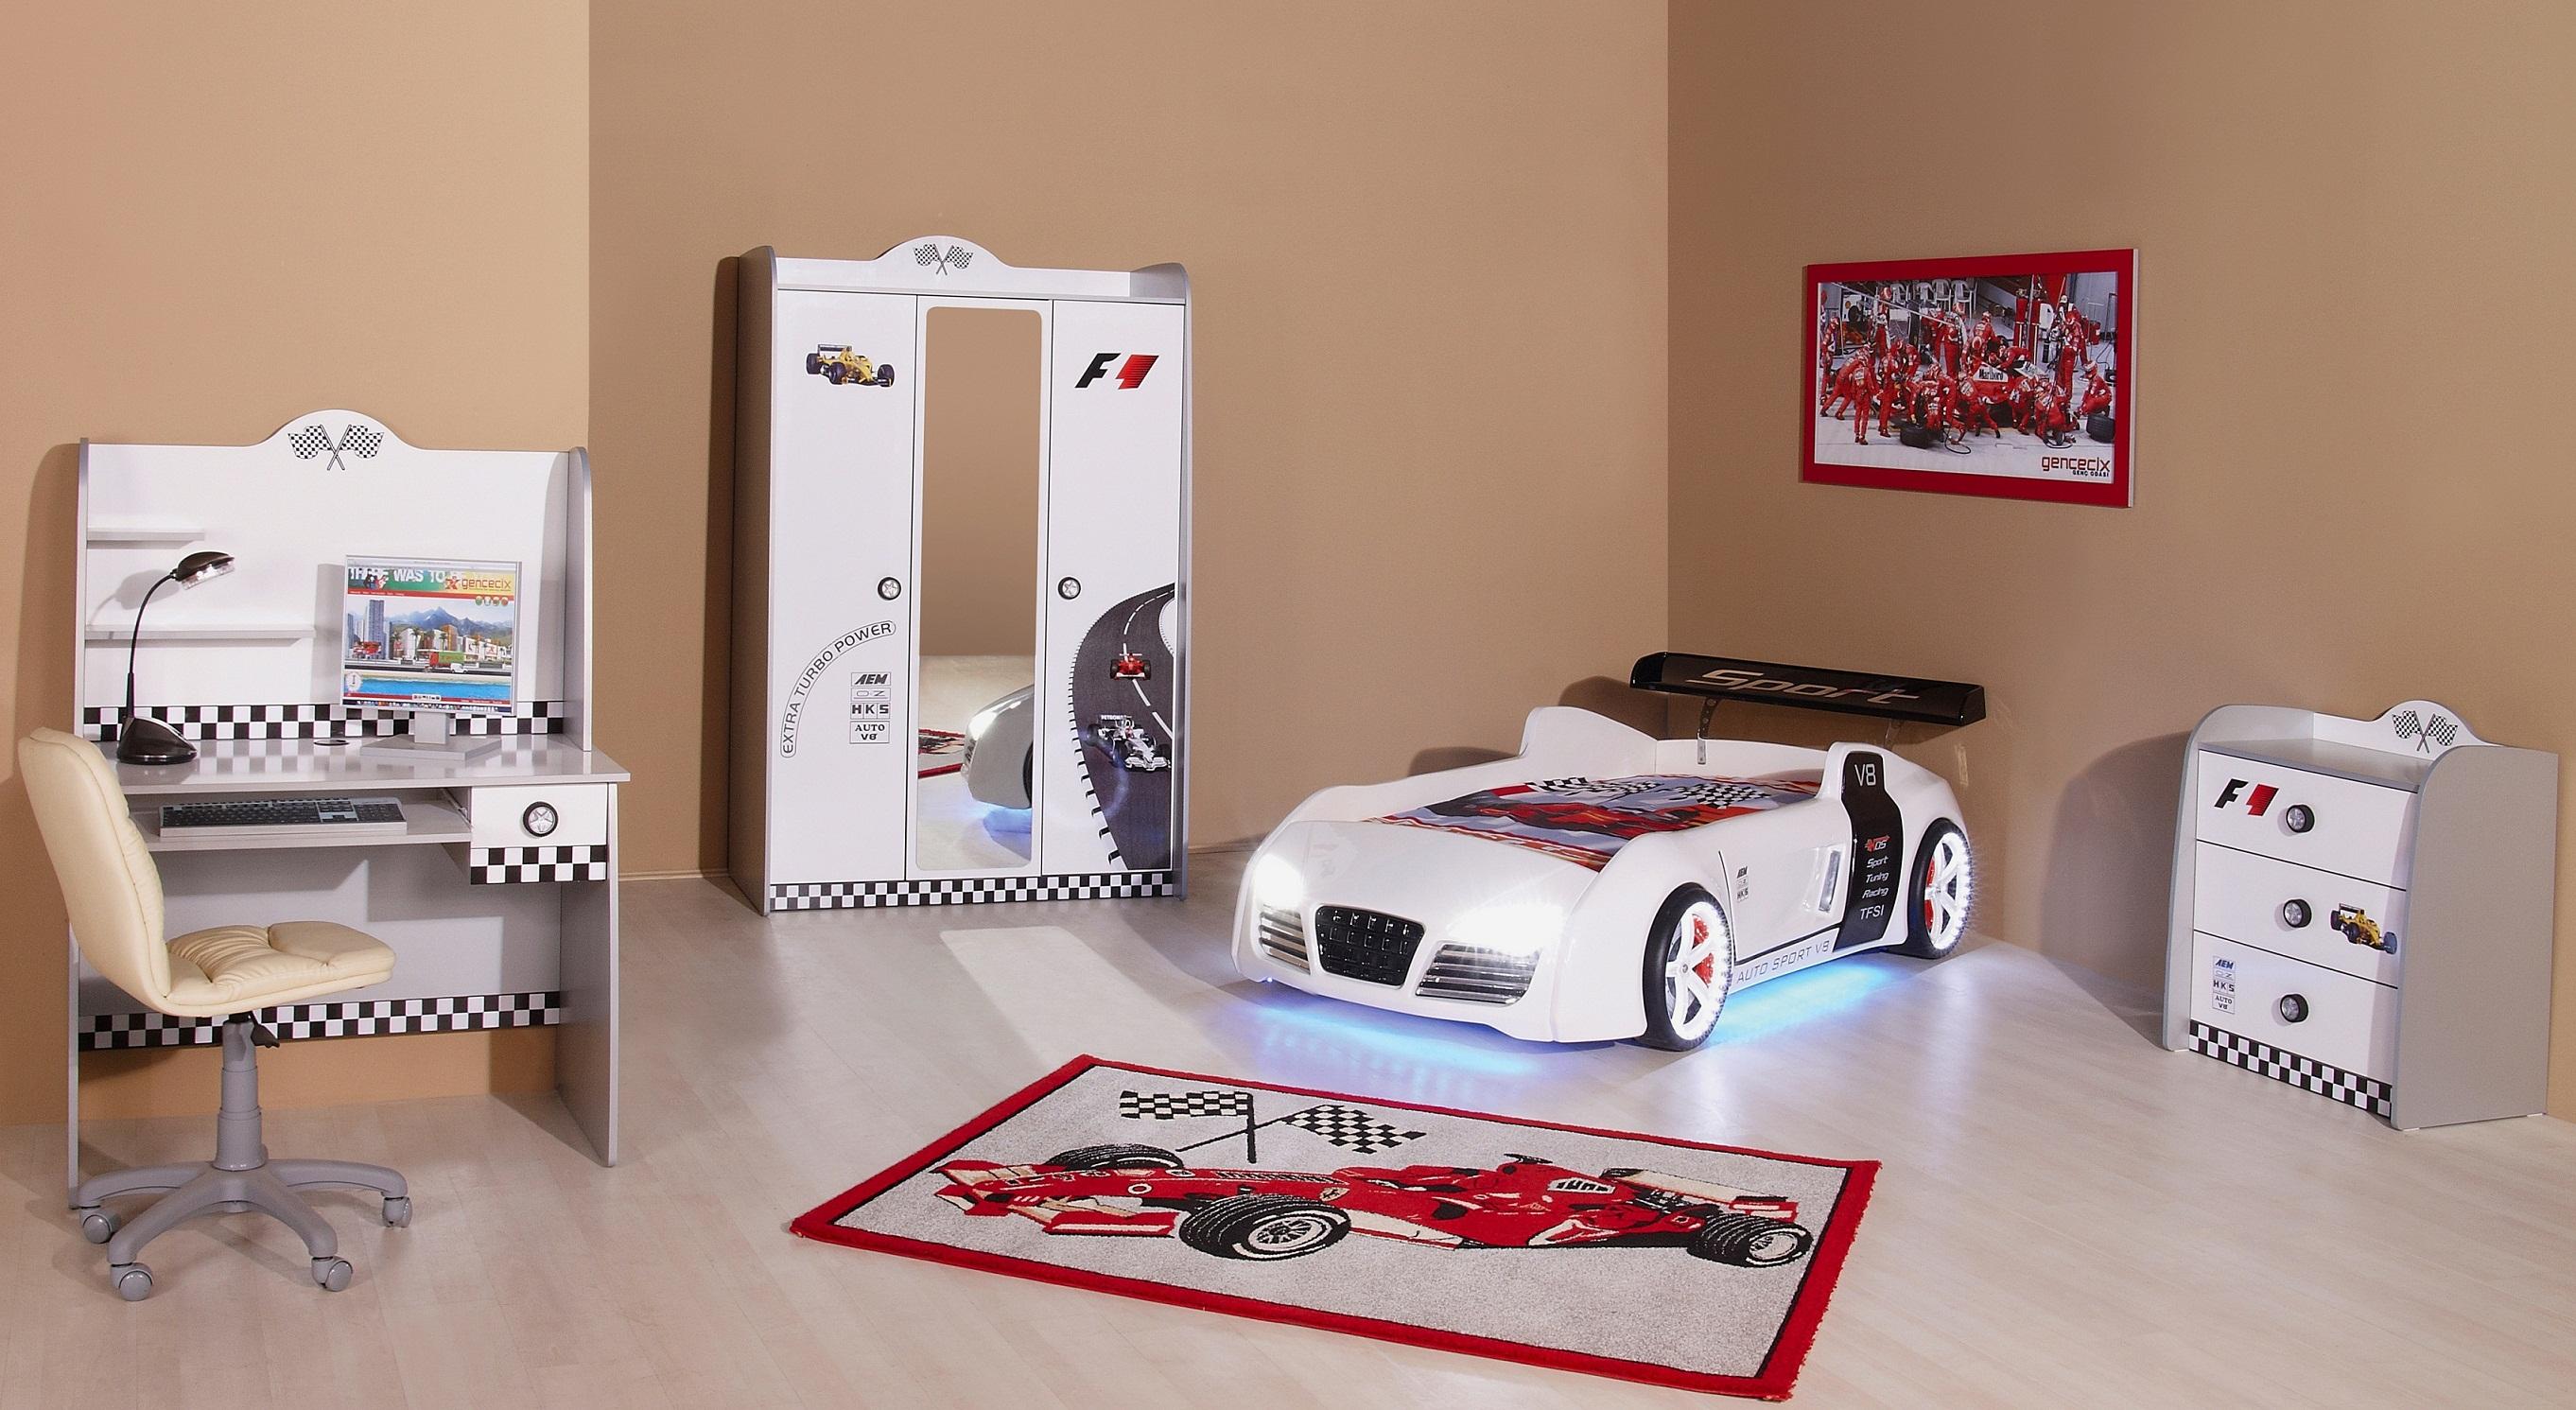 autobett kinder autobetten jungen kinderbett. Black Bedroom Furniture Sets. Home Design Ideas